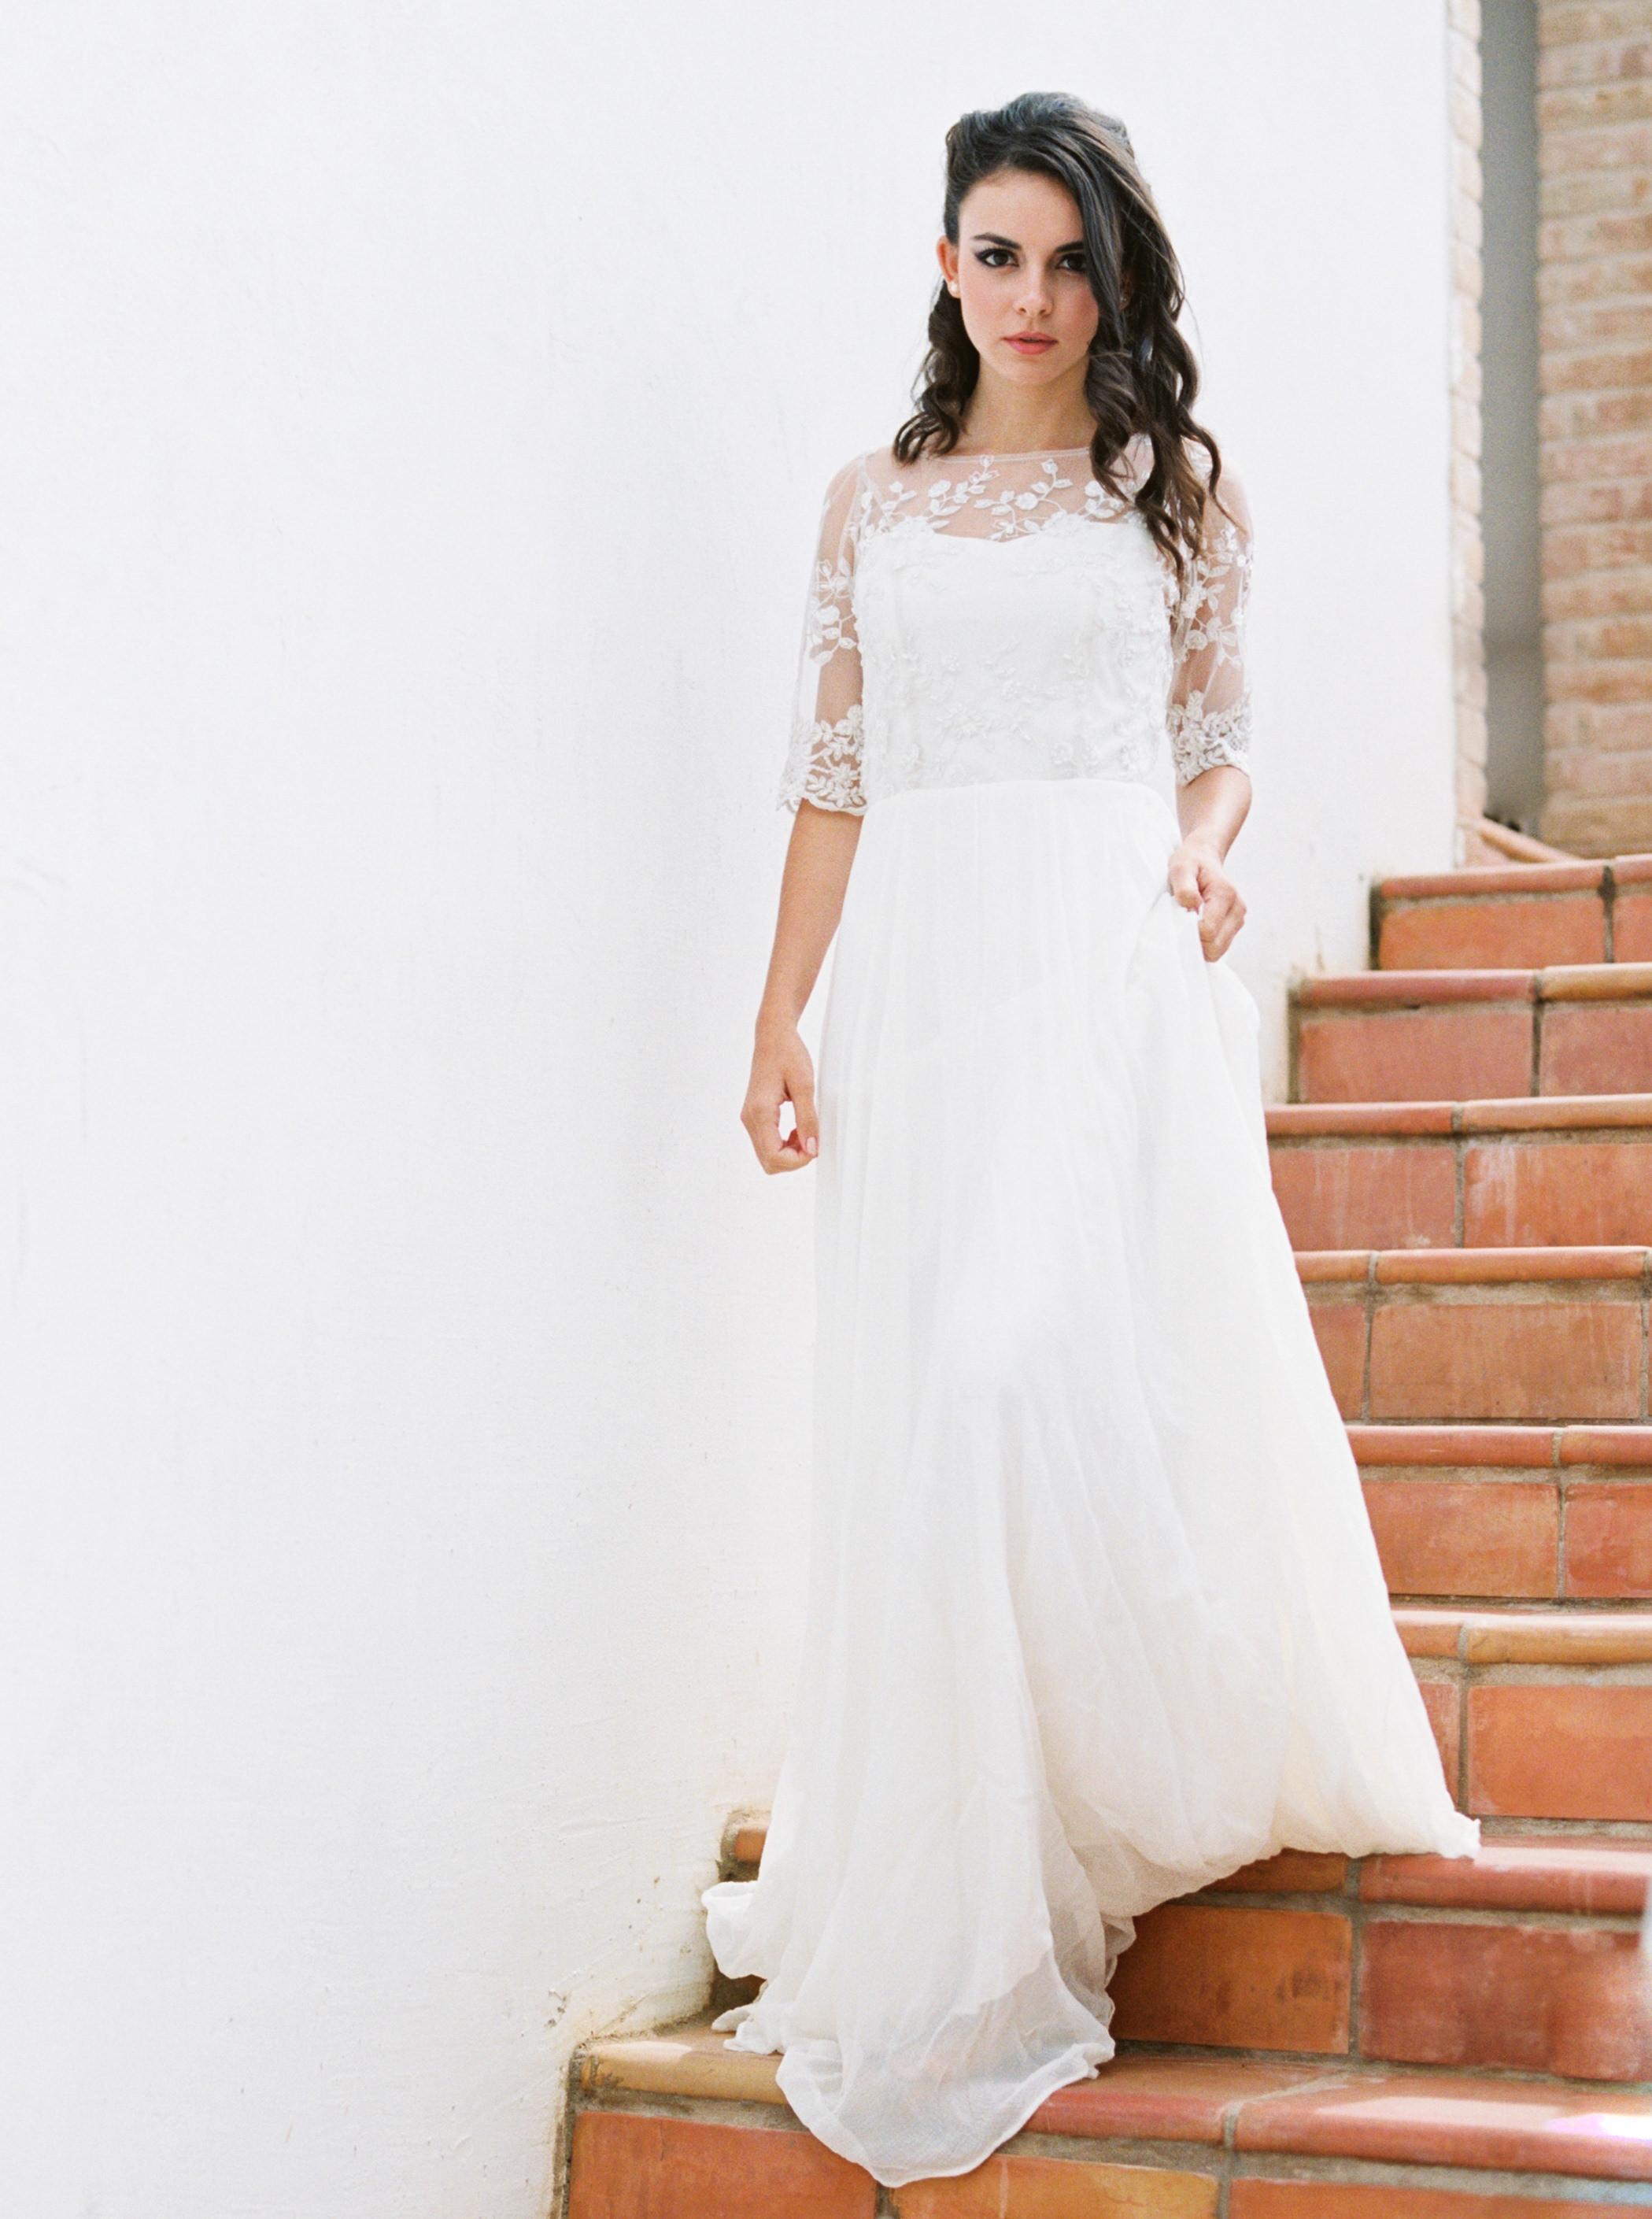 italian wedding photographer -123.jpg